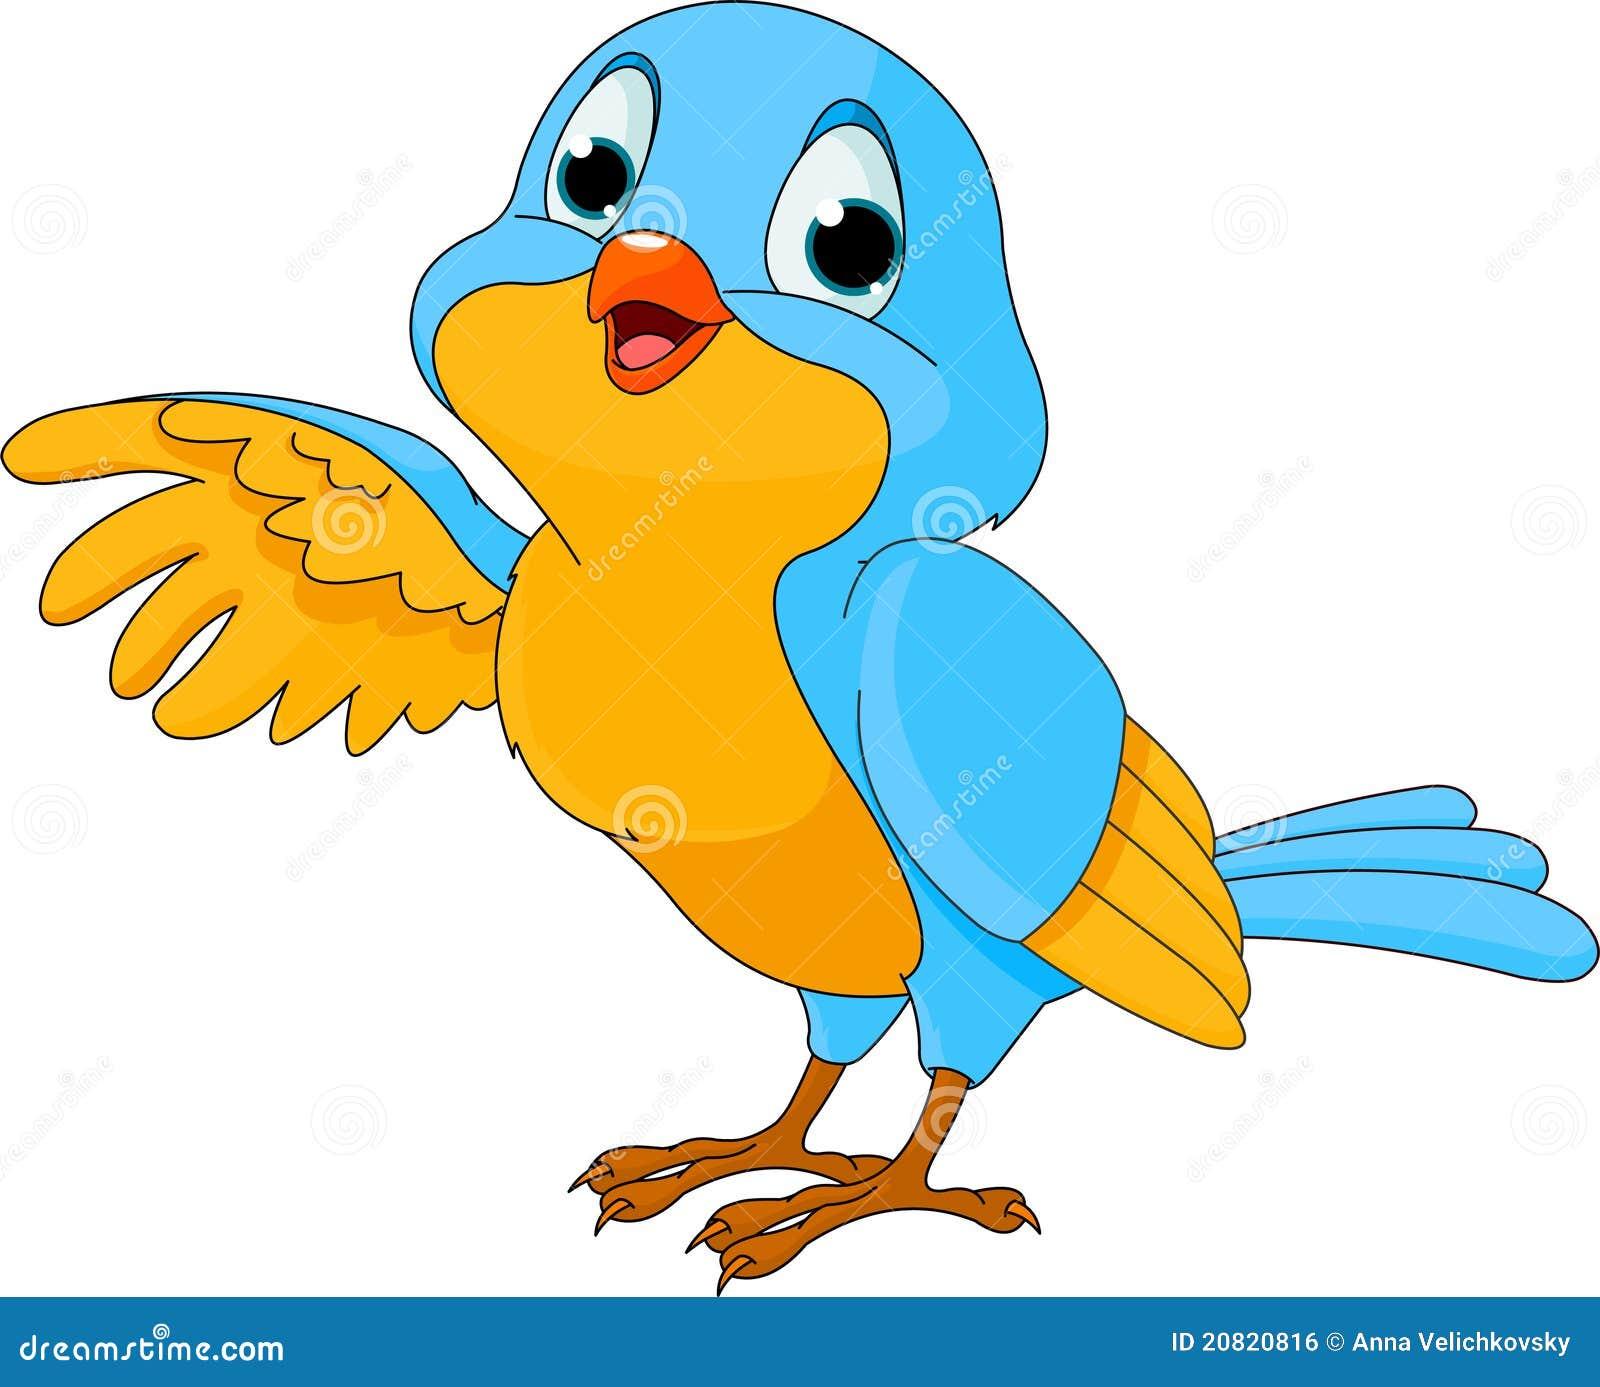 Cute Cartoon Bird Royalty Free Stock Image Image 20820816